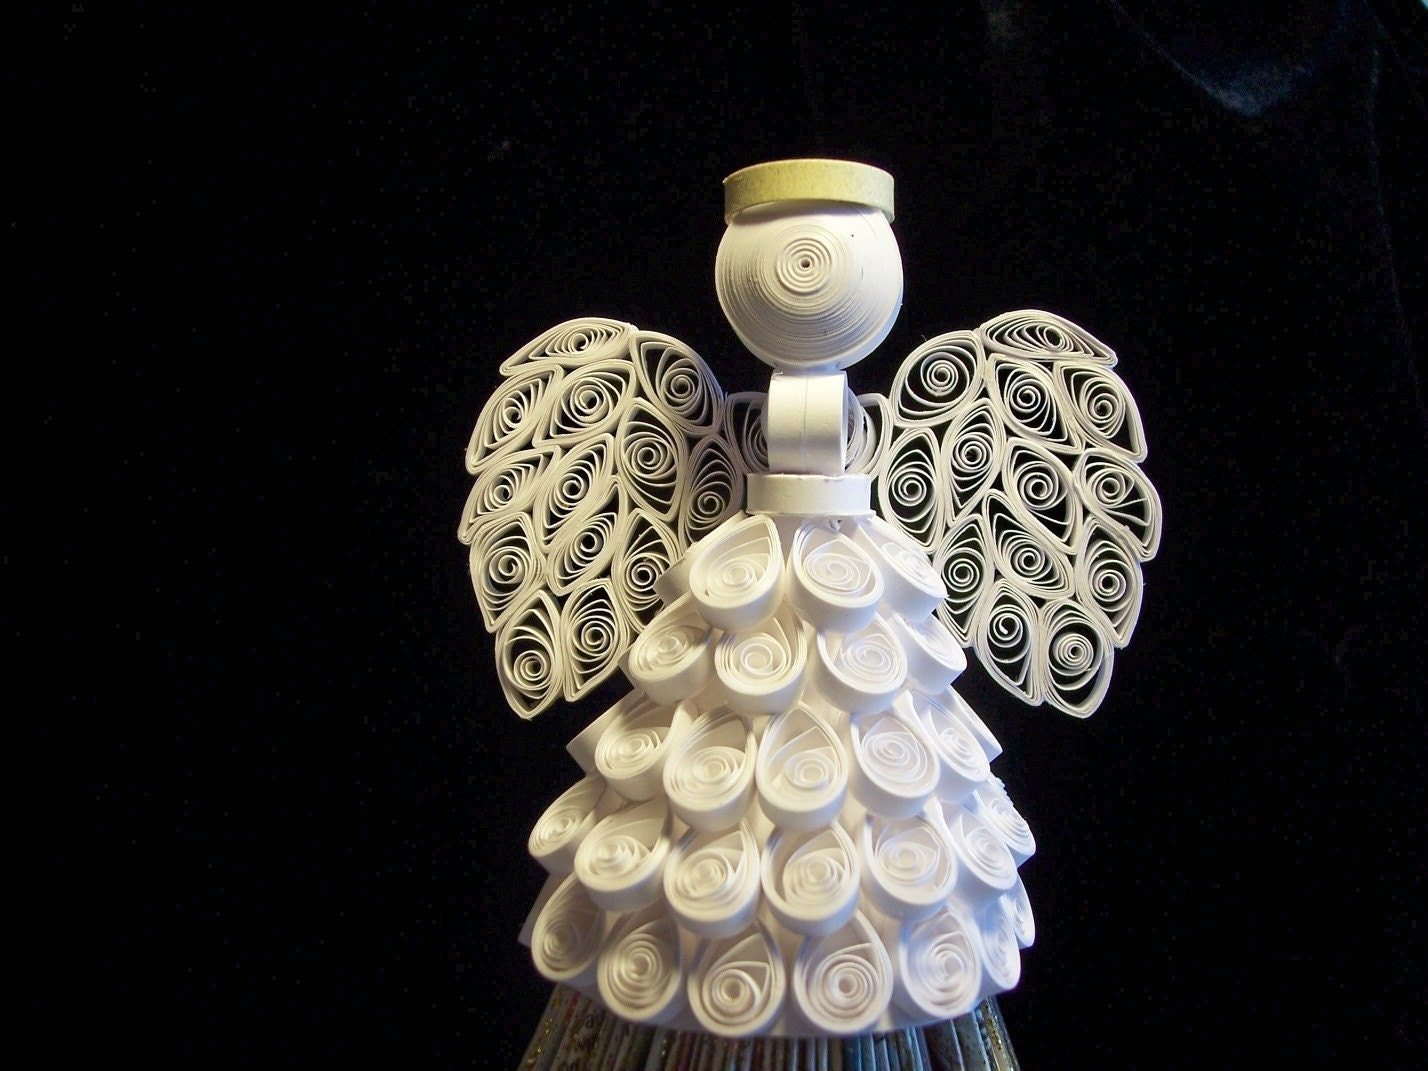 2010 All White Angel Ornament